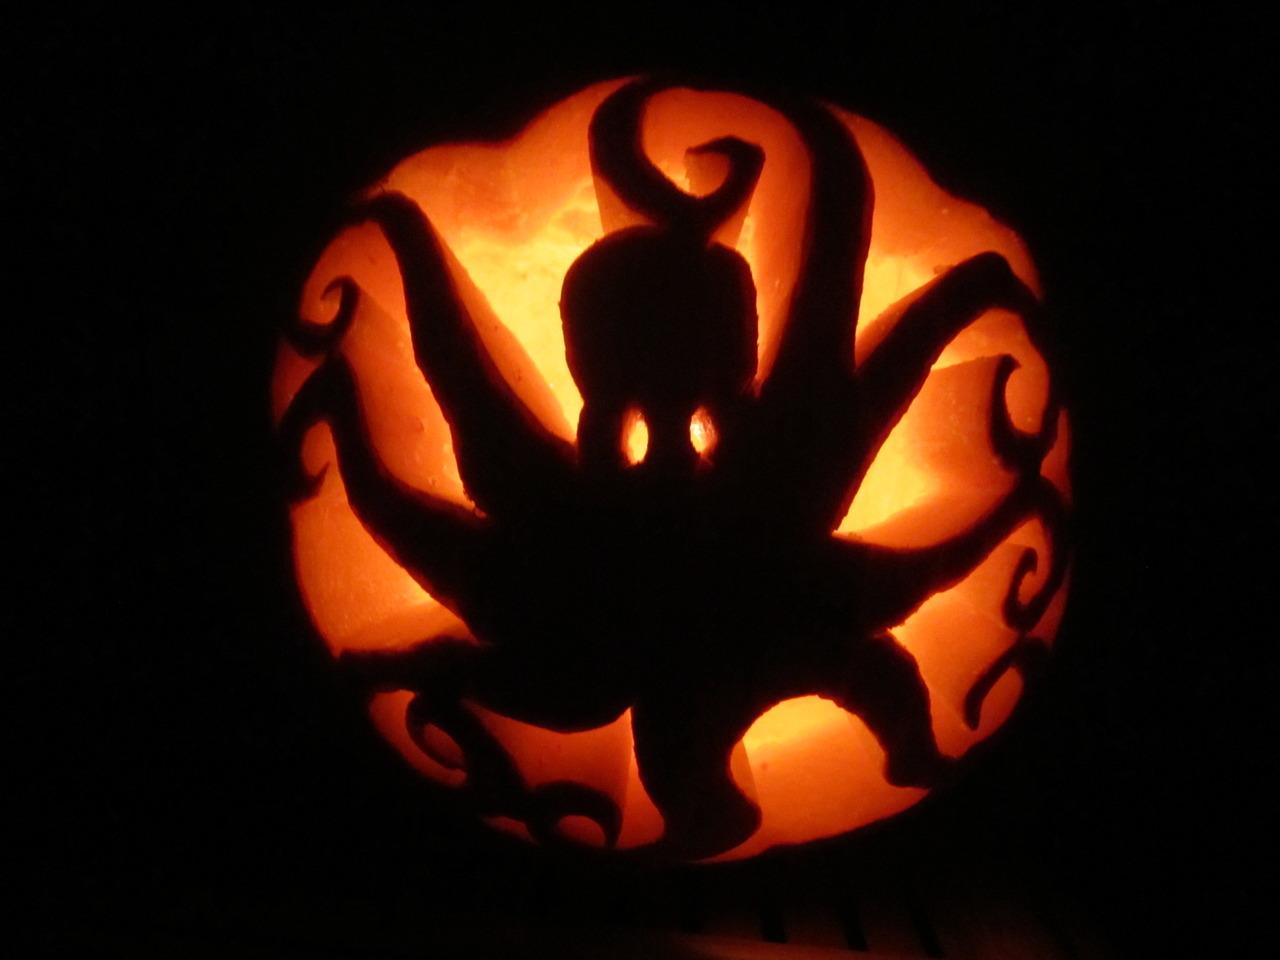 octopuspumpkin.jpg